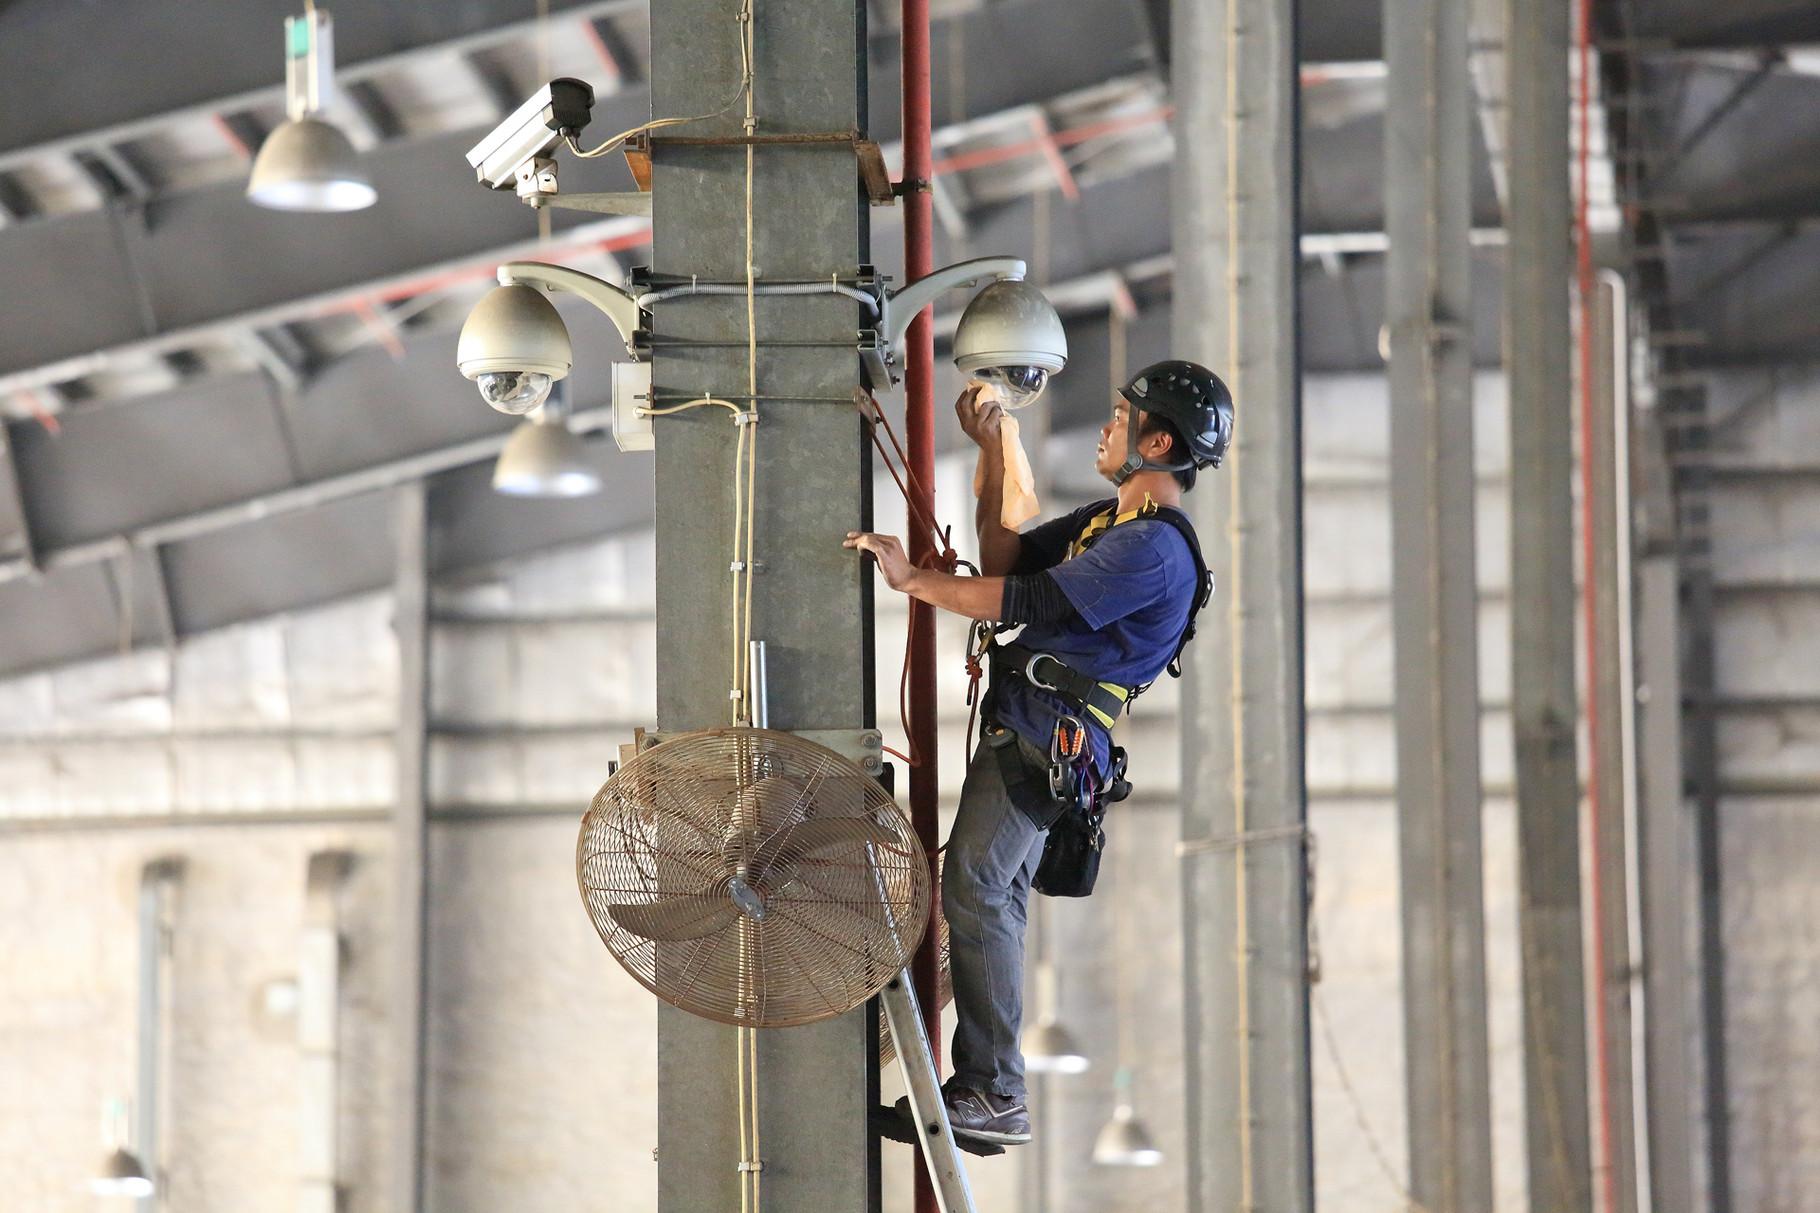 Menzies - CCTV Maintenance Works